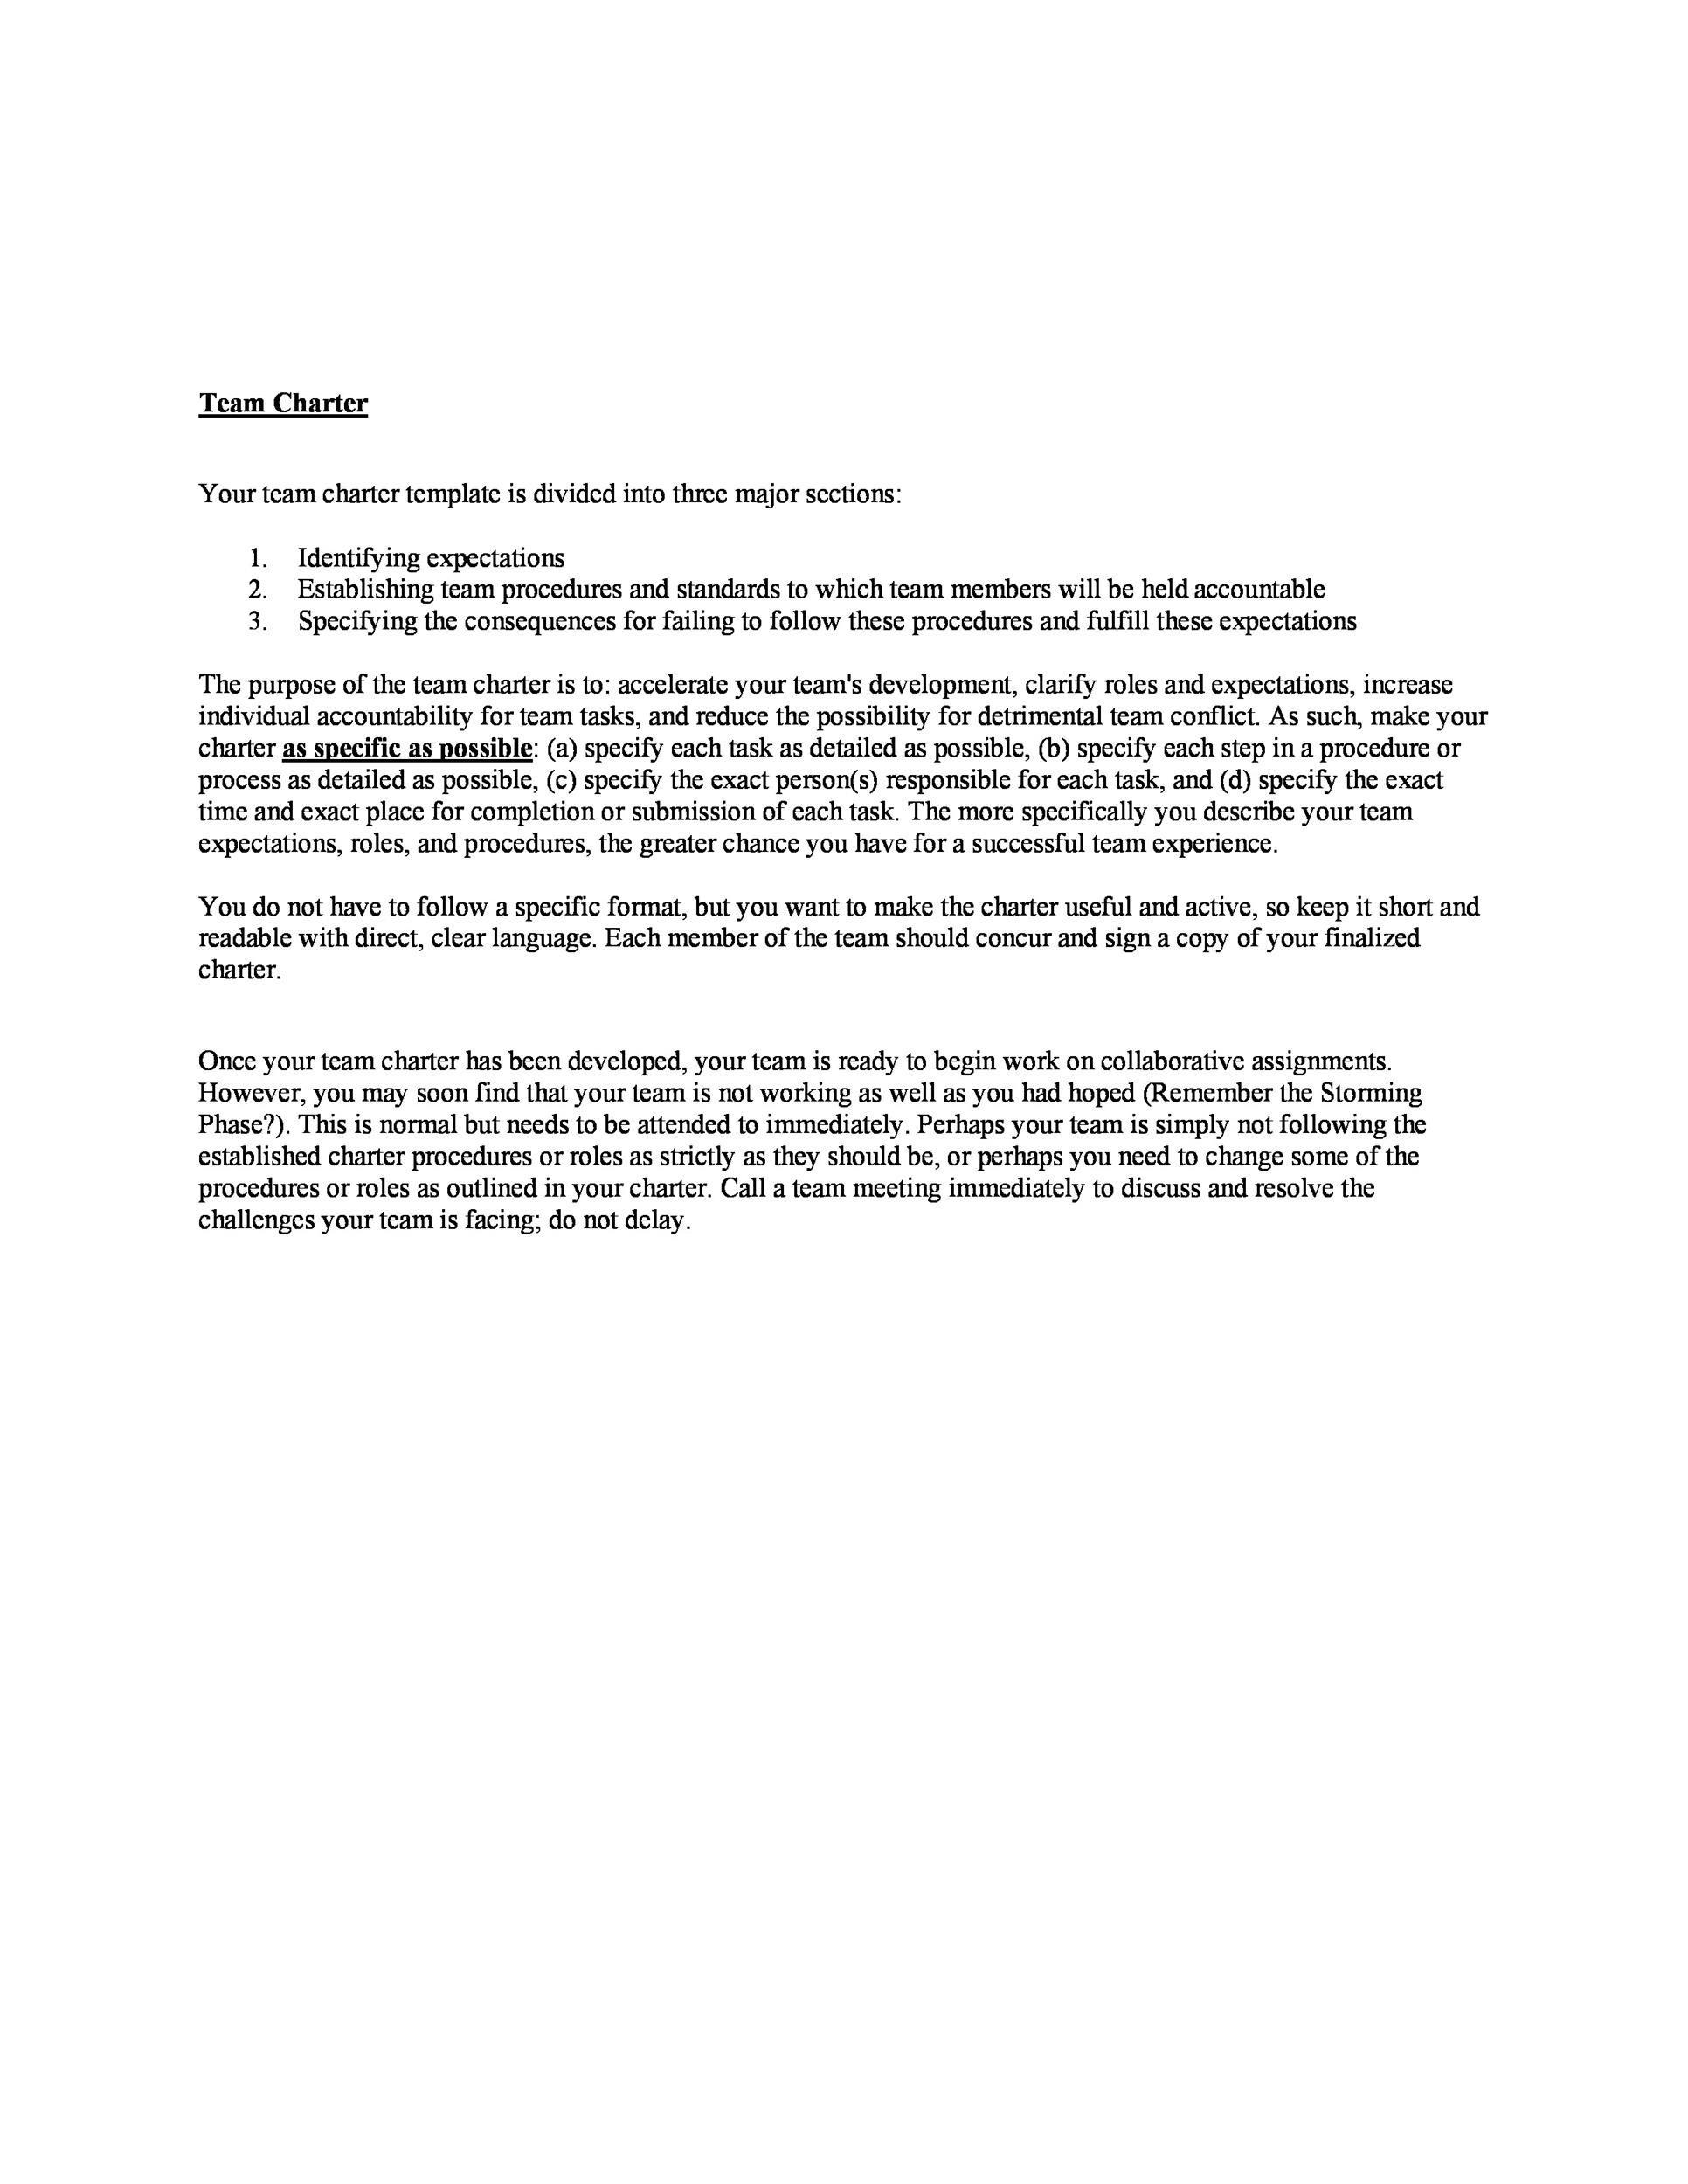 Free team charter template 27